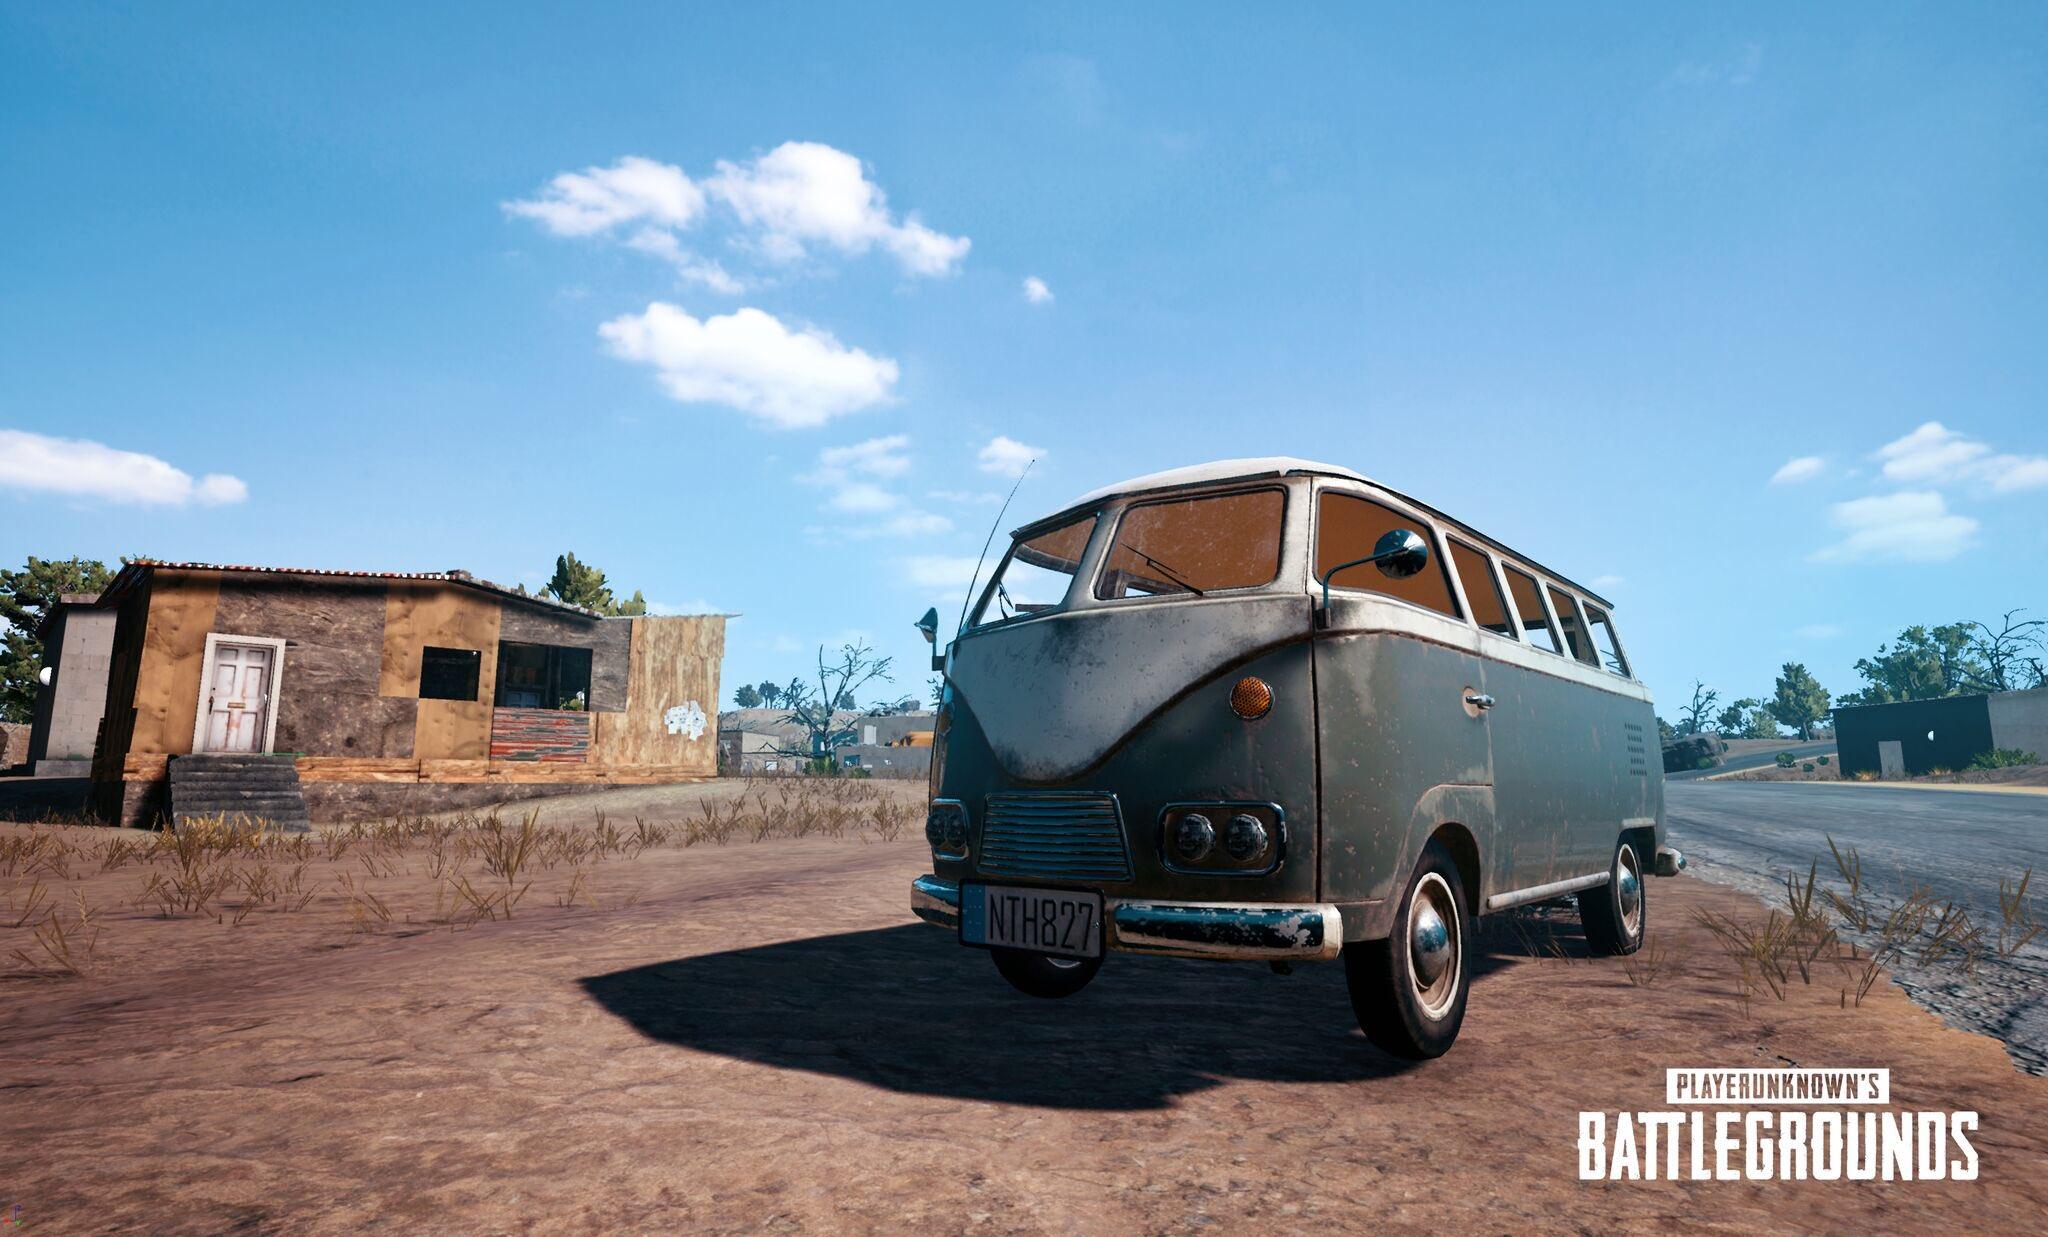 【PUBG】新しい車両はバス!?現在制作中の新車両のデザインが公開